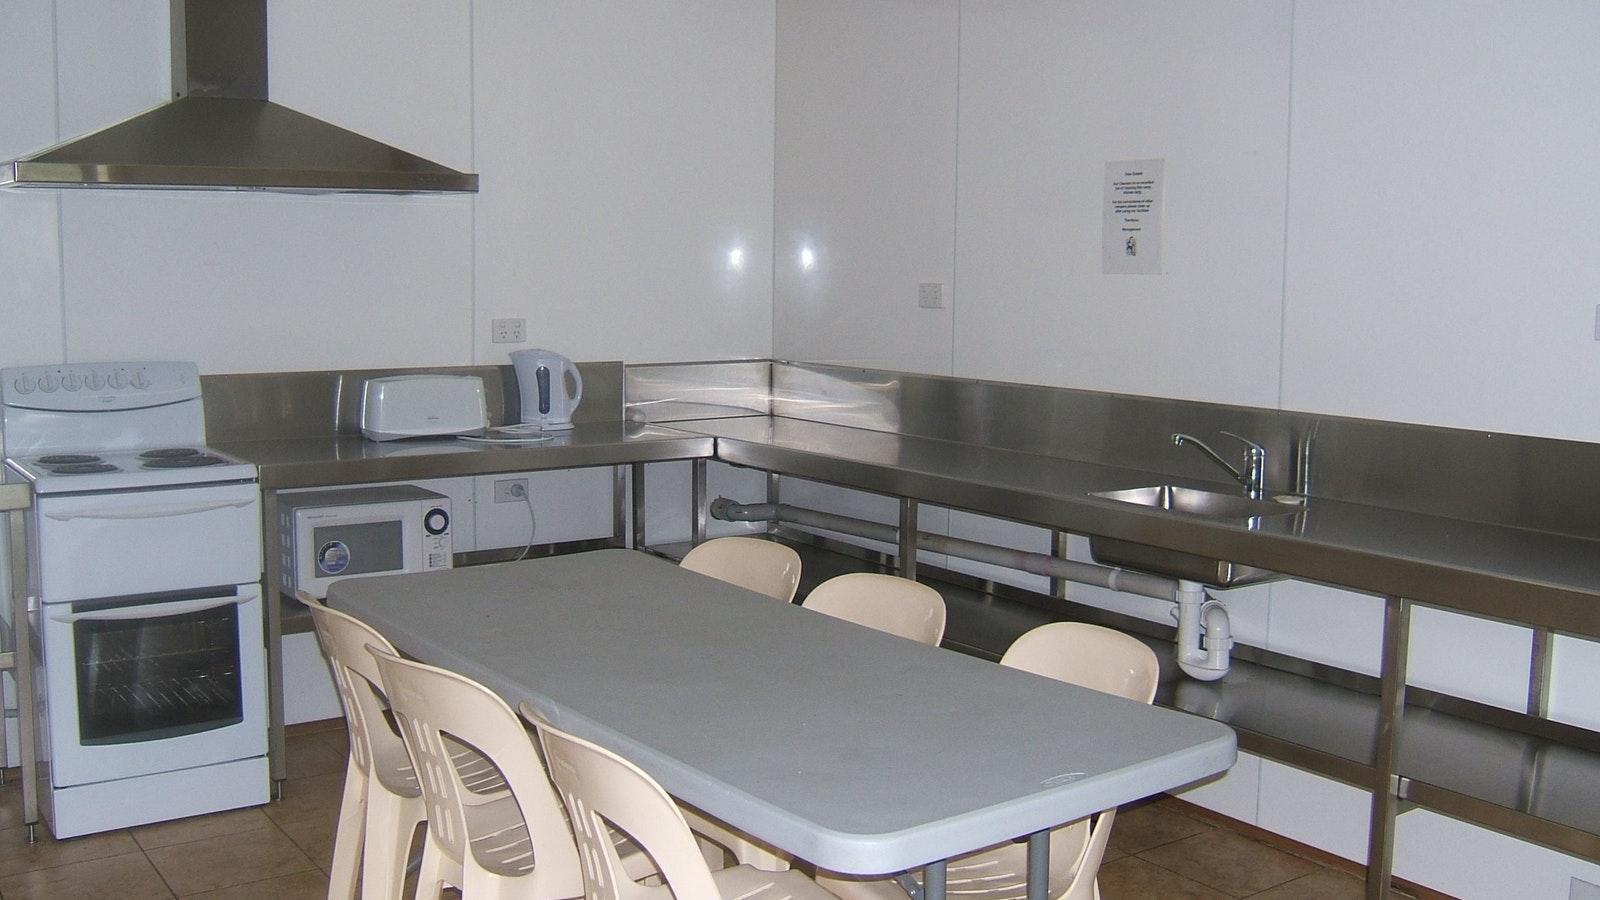 camp kitchen Melbourne BIG4 caravan park